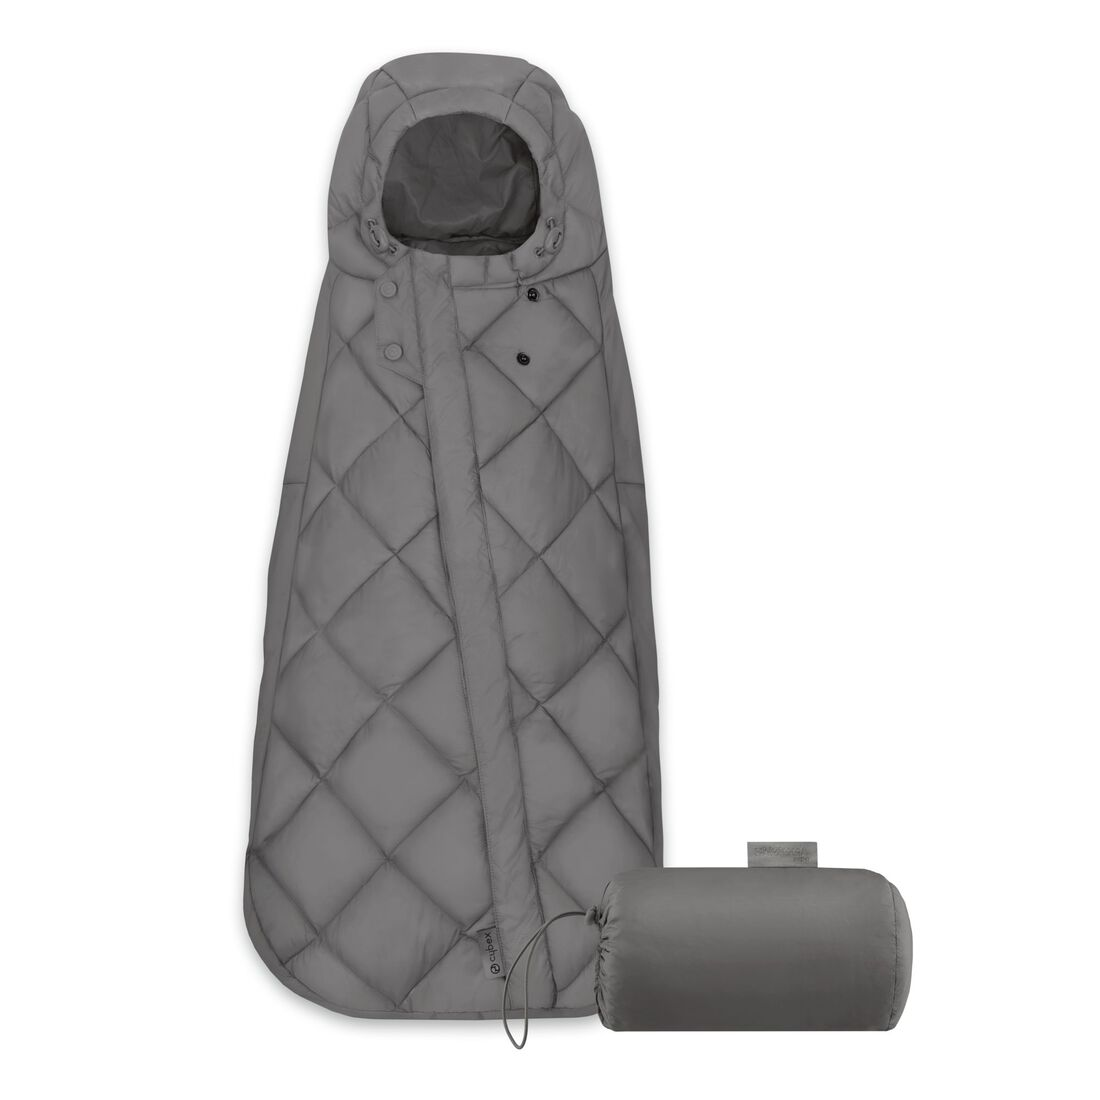 CYBEX Snogga Mini - Soho Grey in Soho Grey large Bild 1